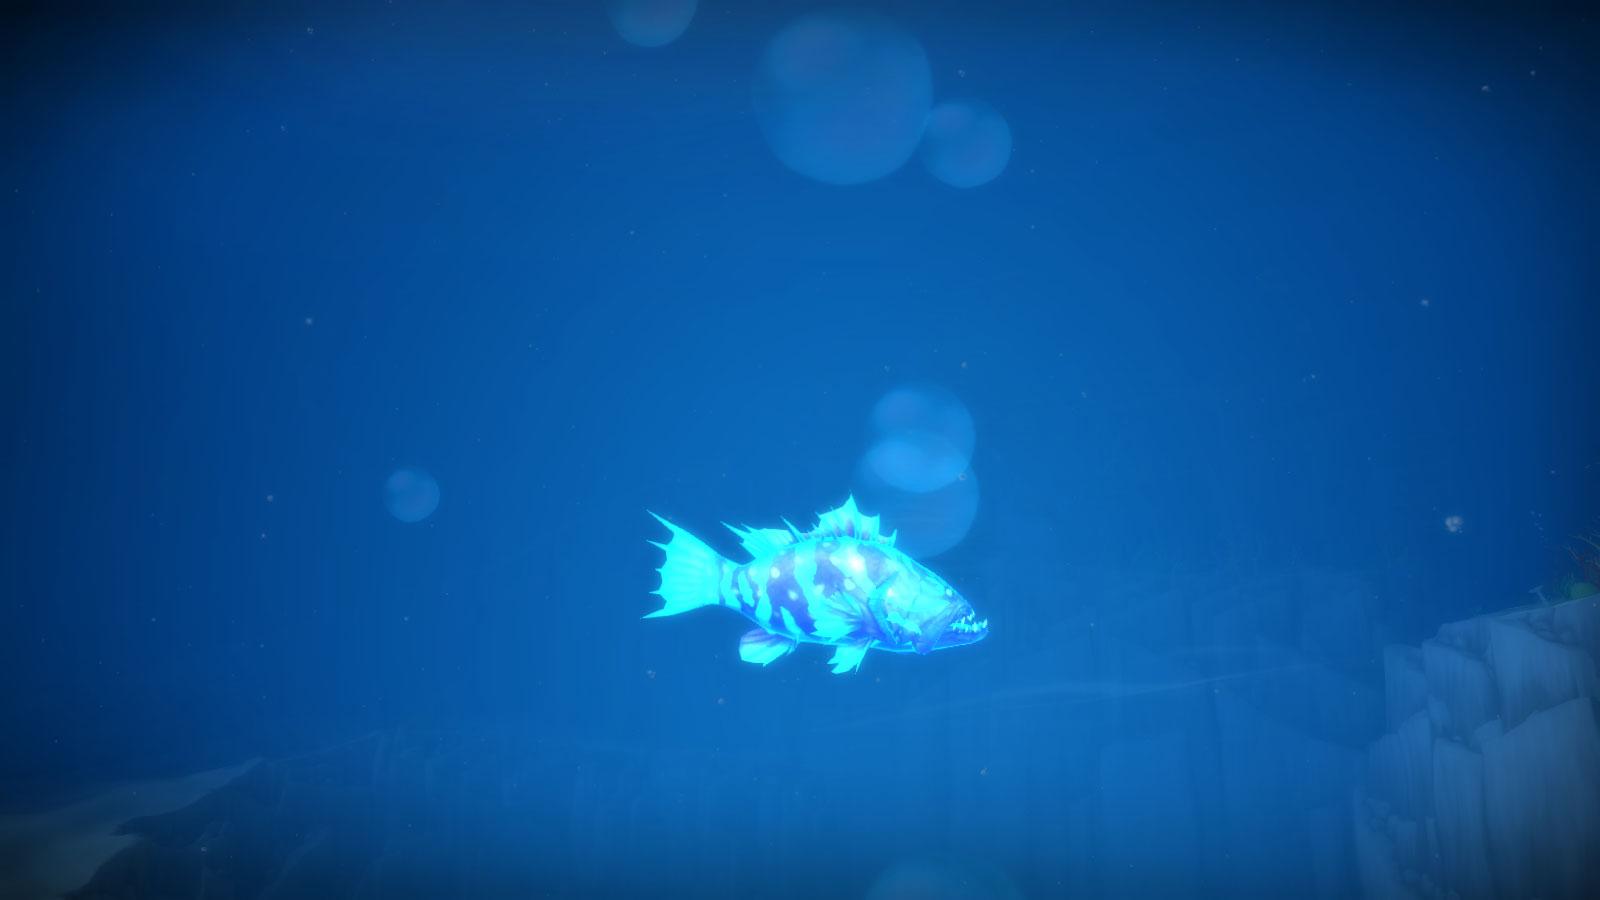 Mérou luminescent